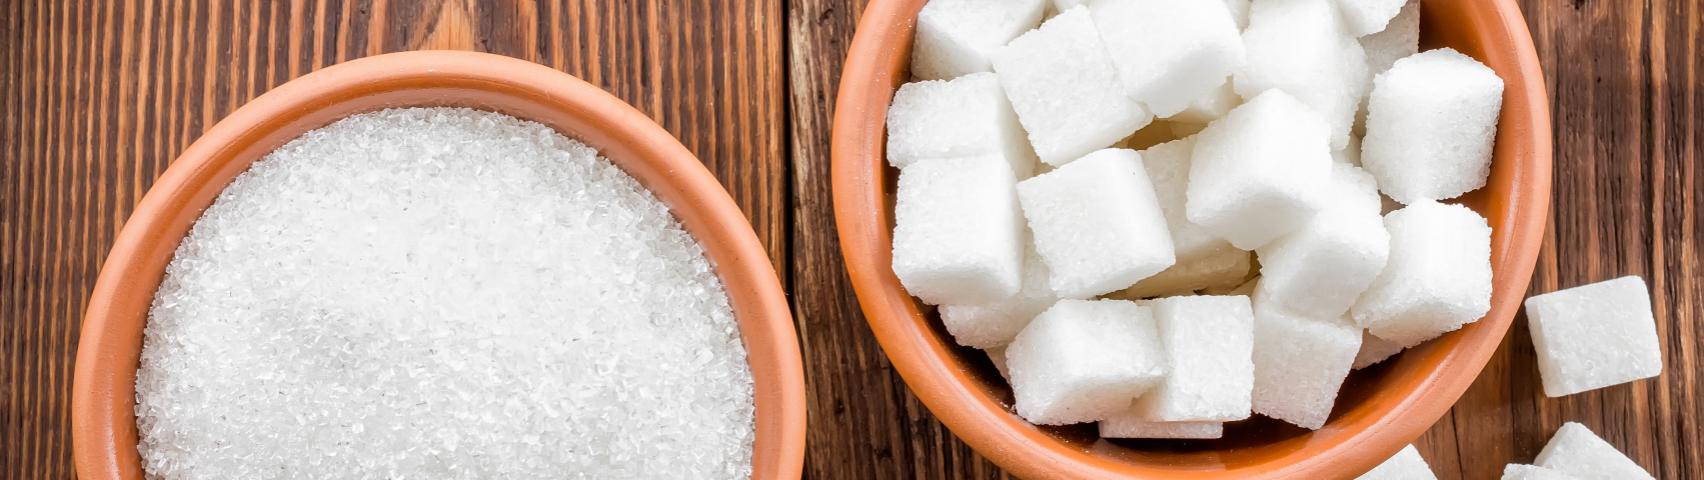 one bowl of sugar granules, one of sugar cubes